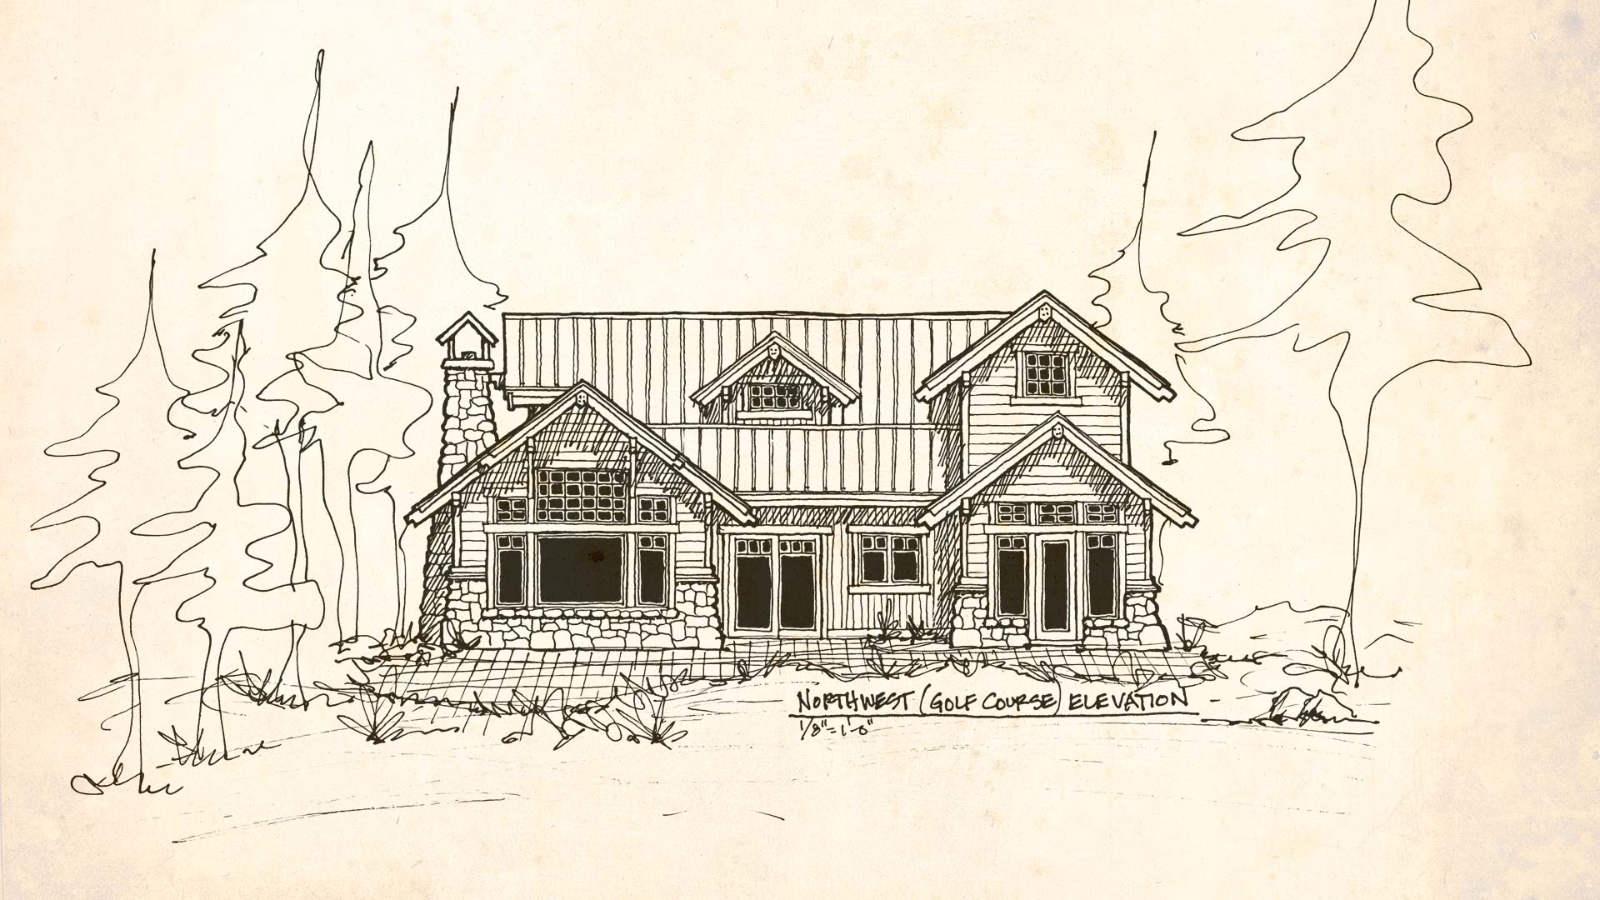 SUNCADIA RESORT HOME